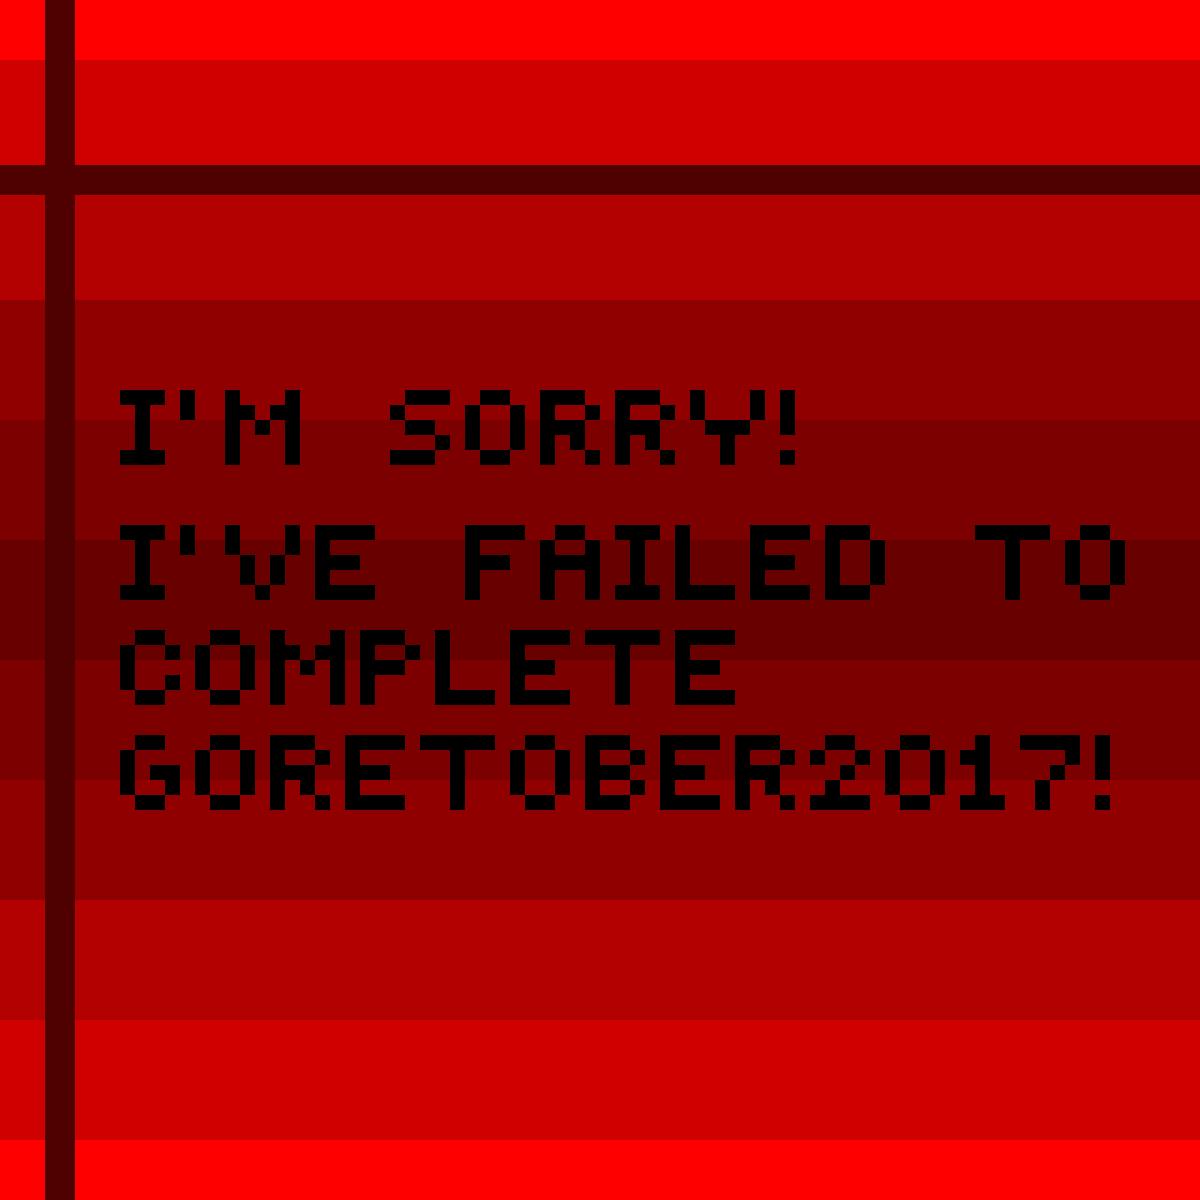 main-image-Goretober Apology  by FennixFox